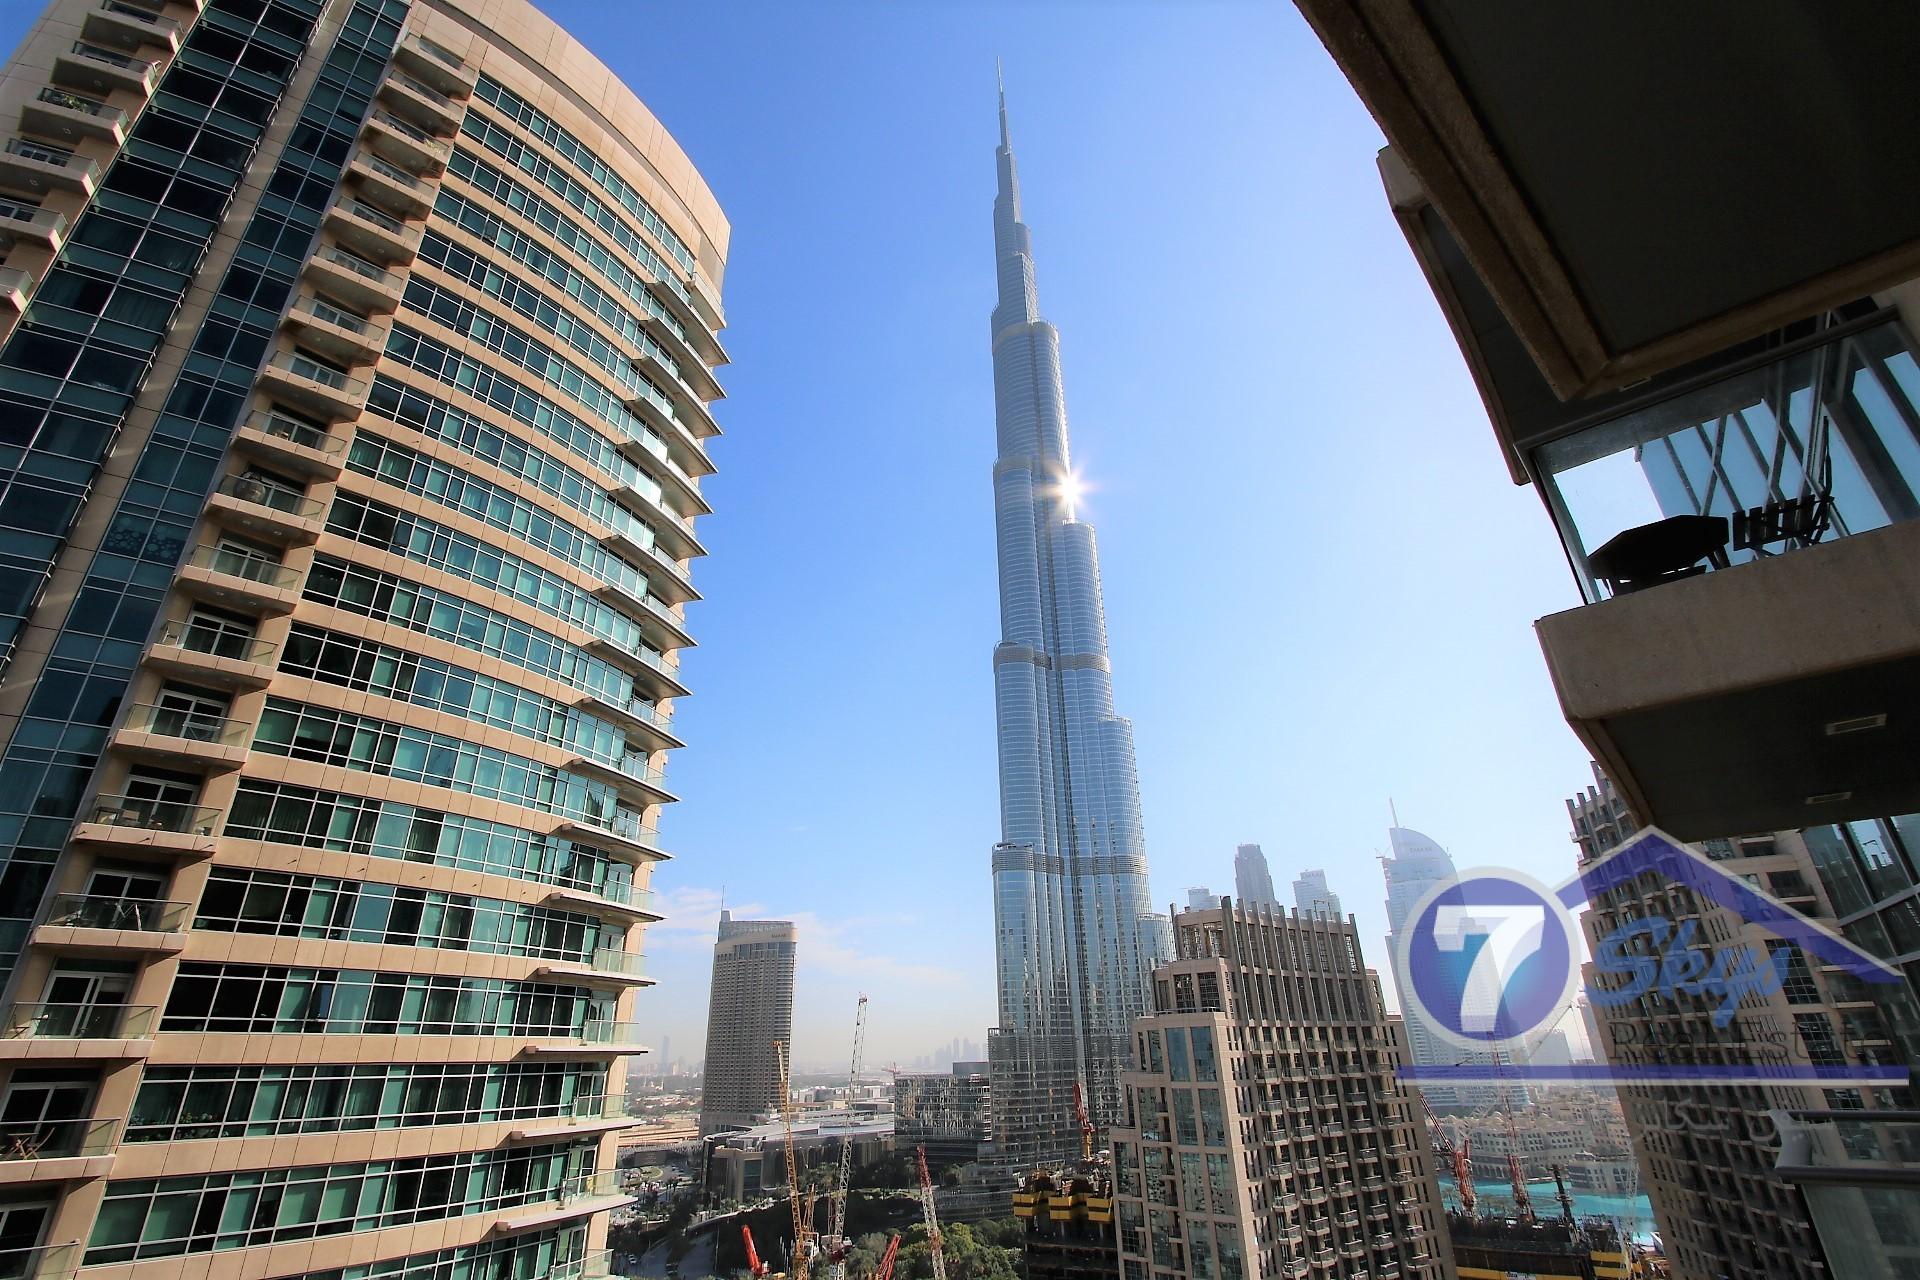 1bhk-unfurnished-with-burj-khalifa-view